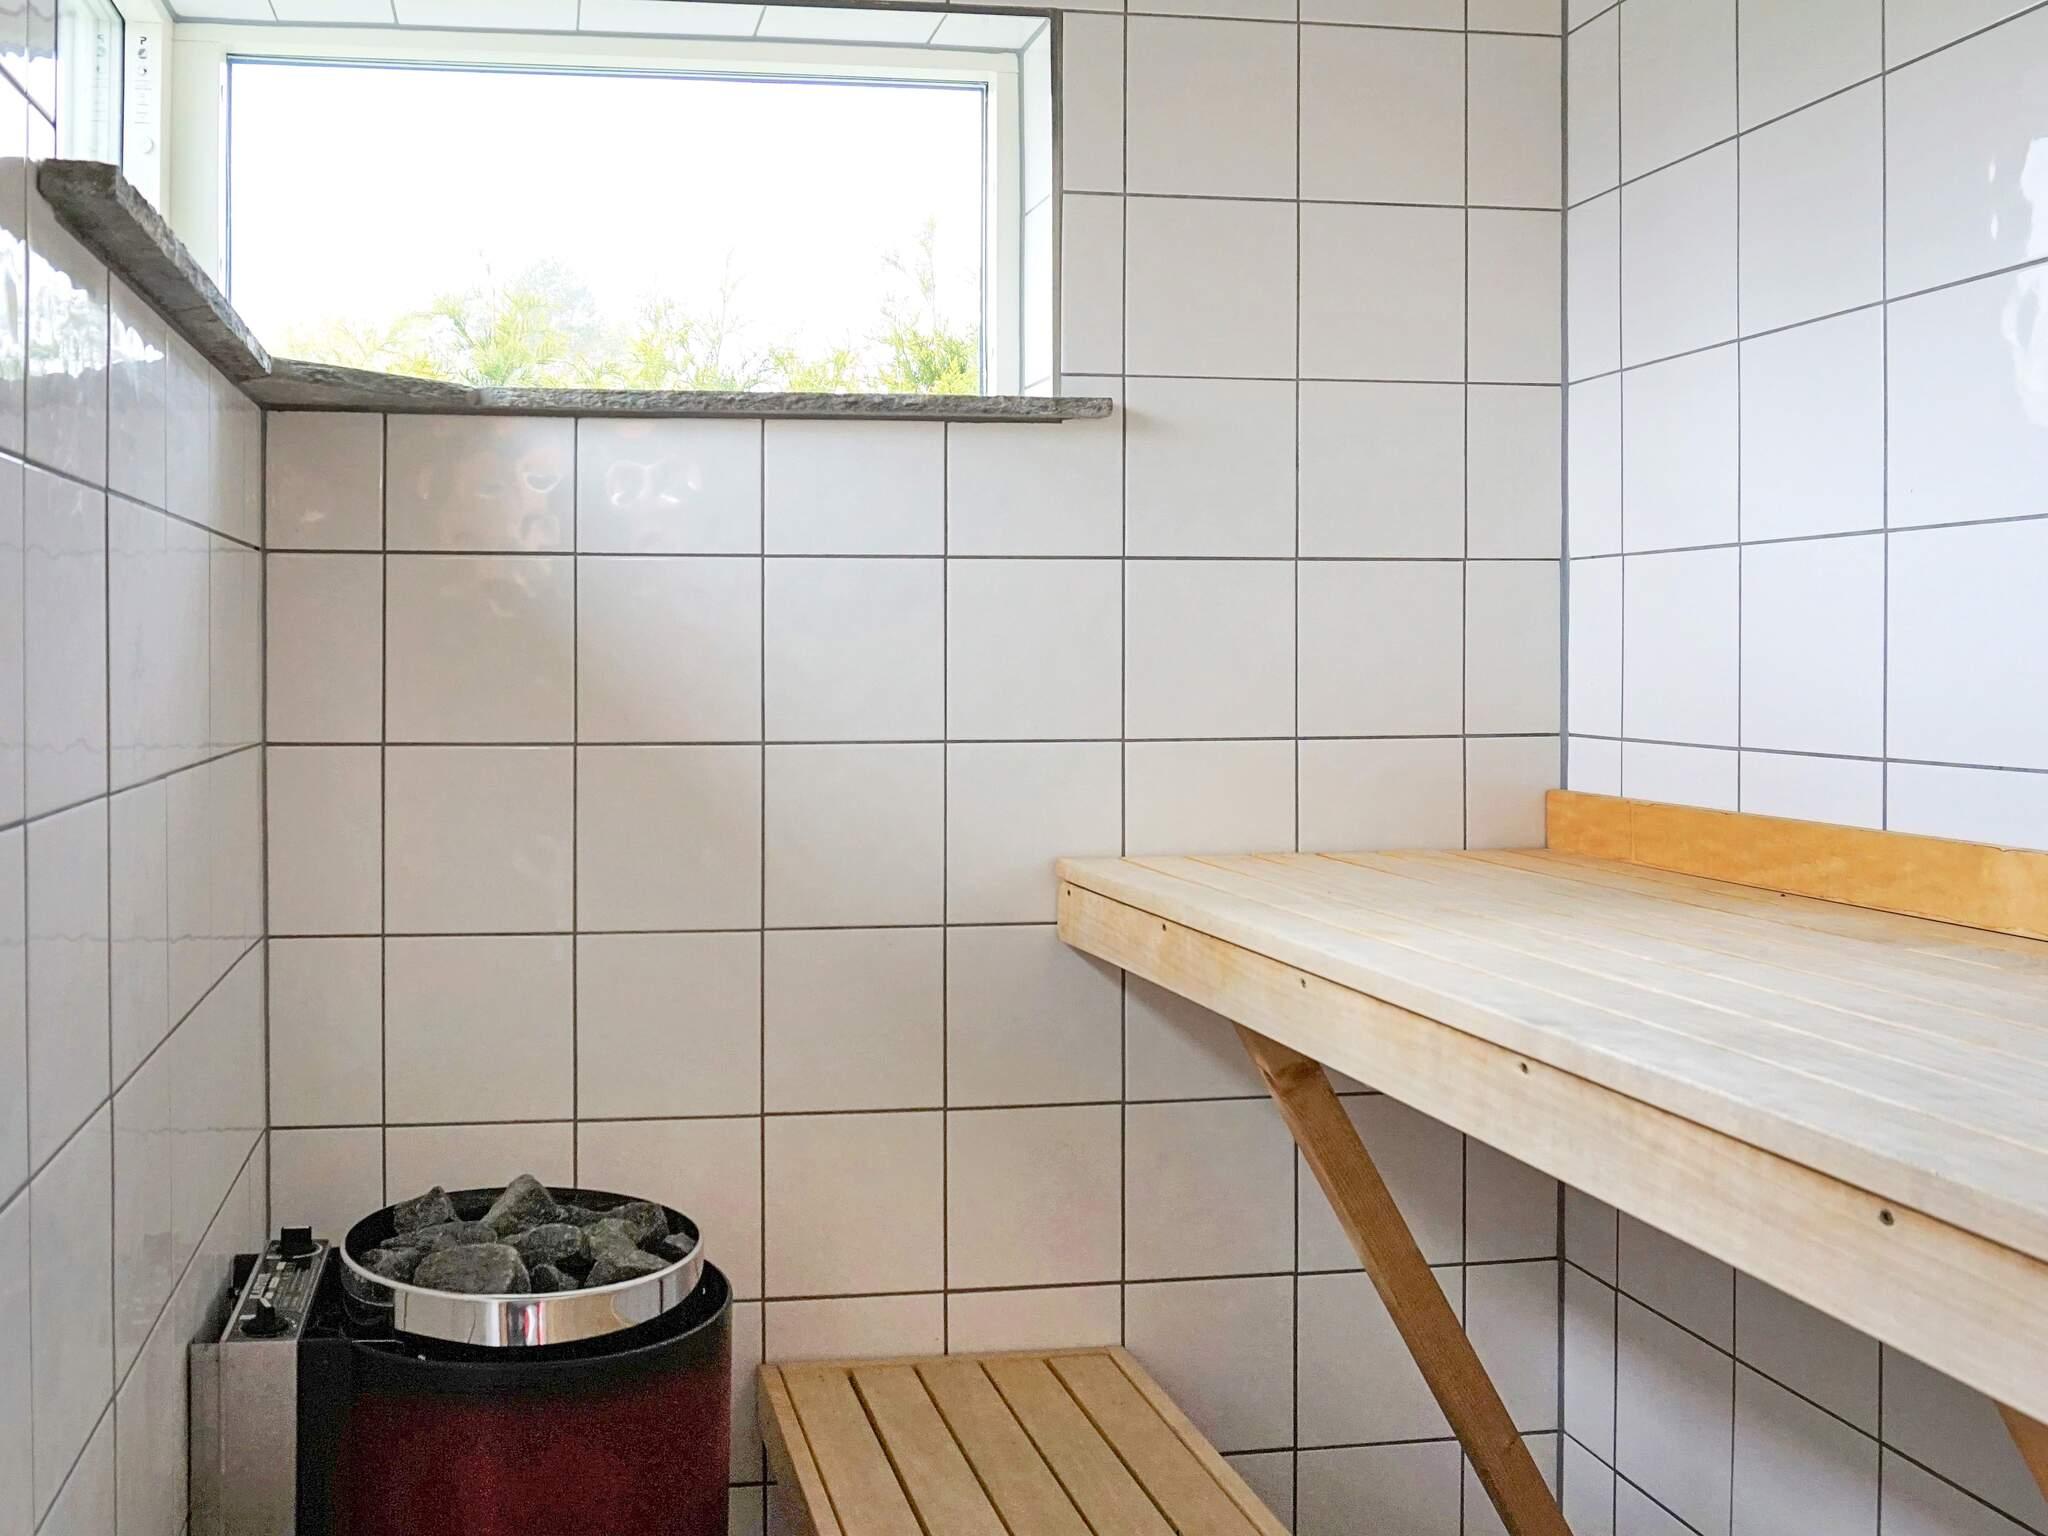 Ferienhaus Onsala (2619121), Onsala, Hallands län, Südschweden, Schweden, Bild 2